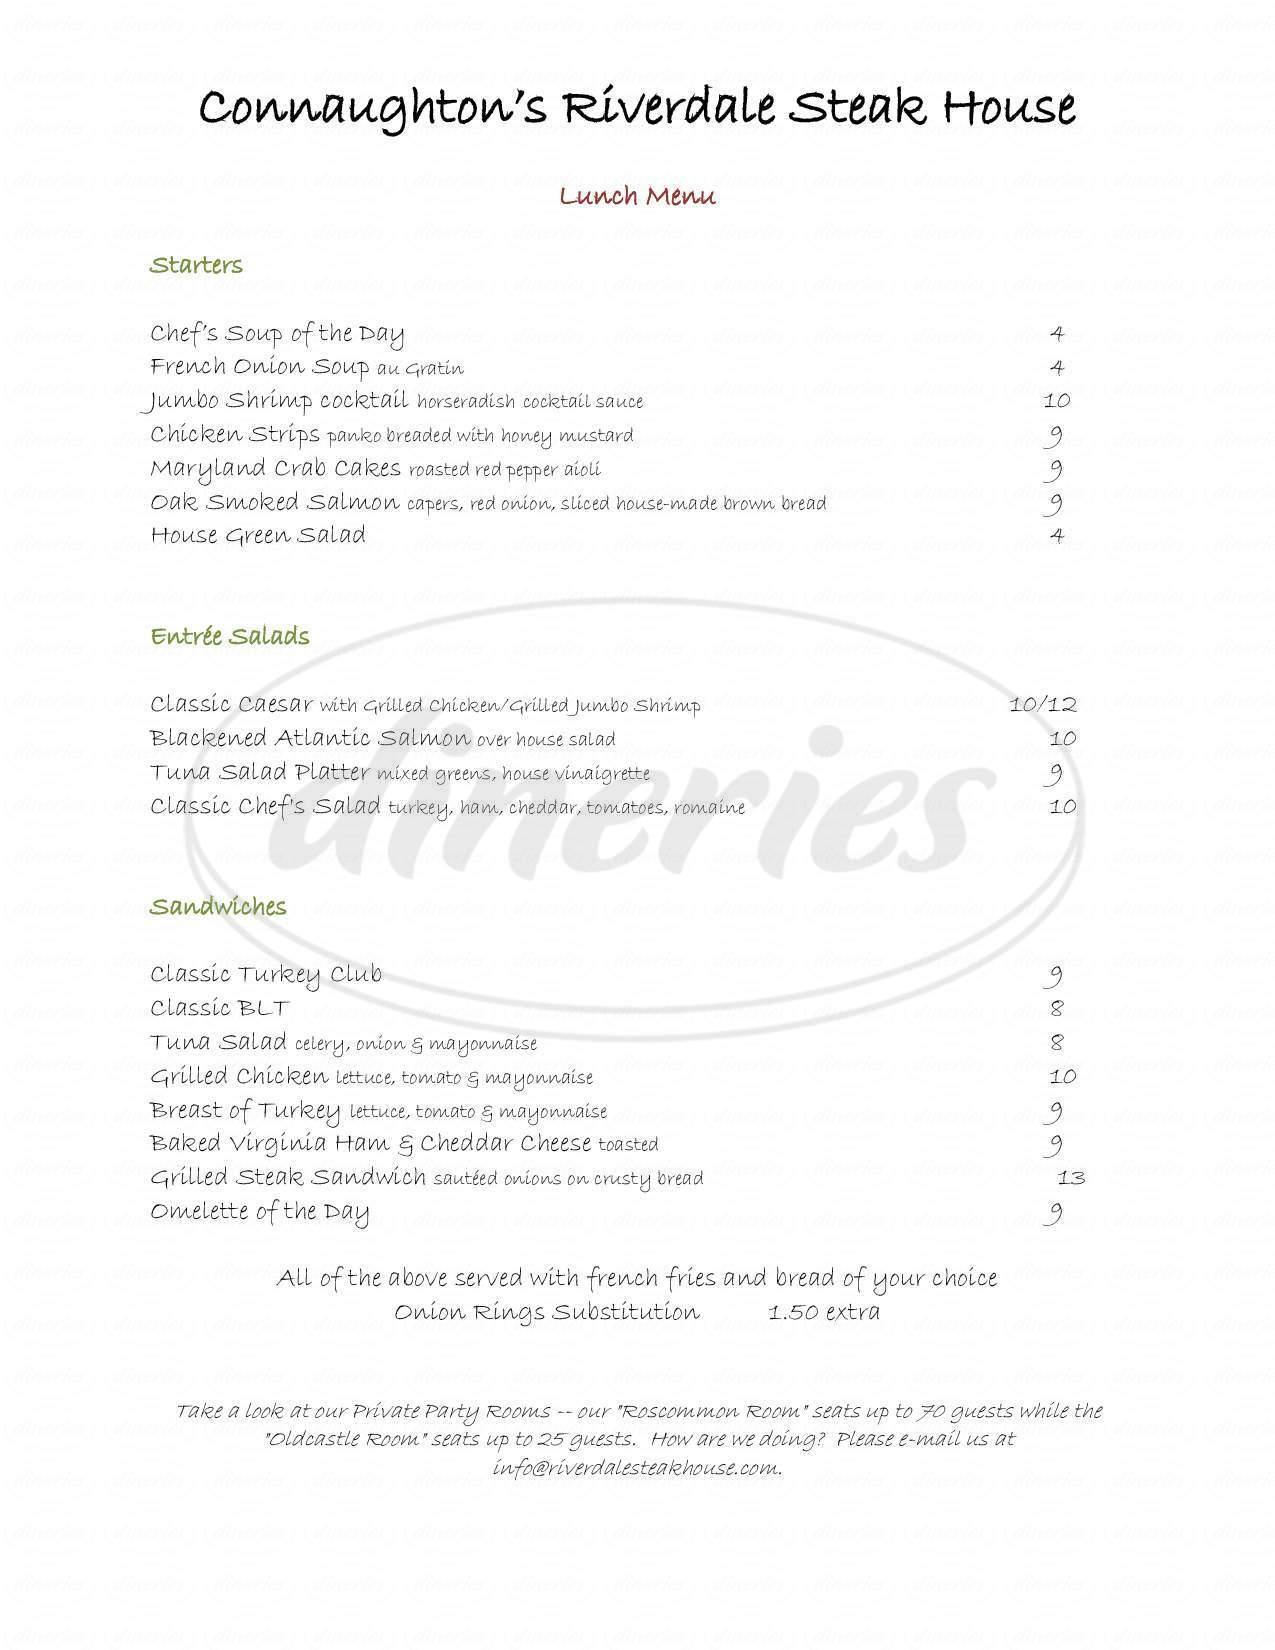 menu for Riverdale Steak House